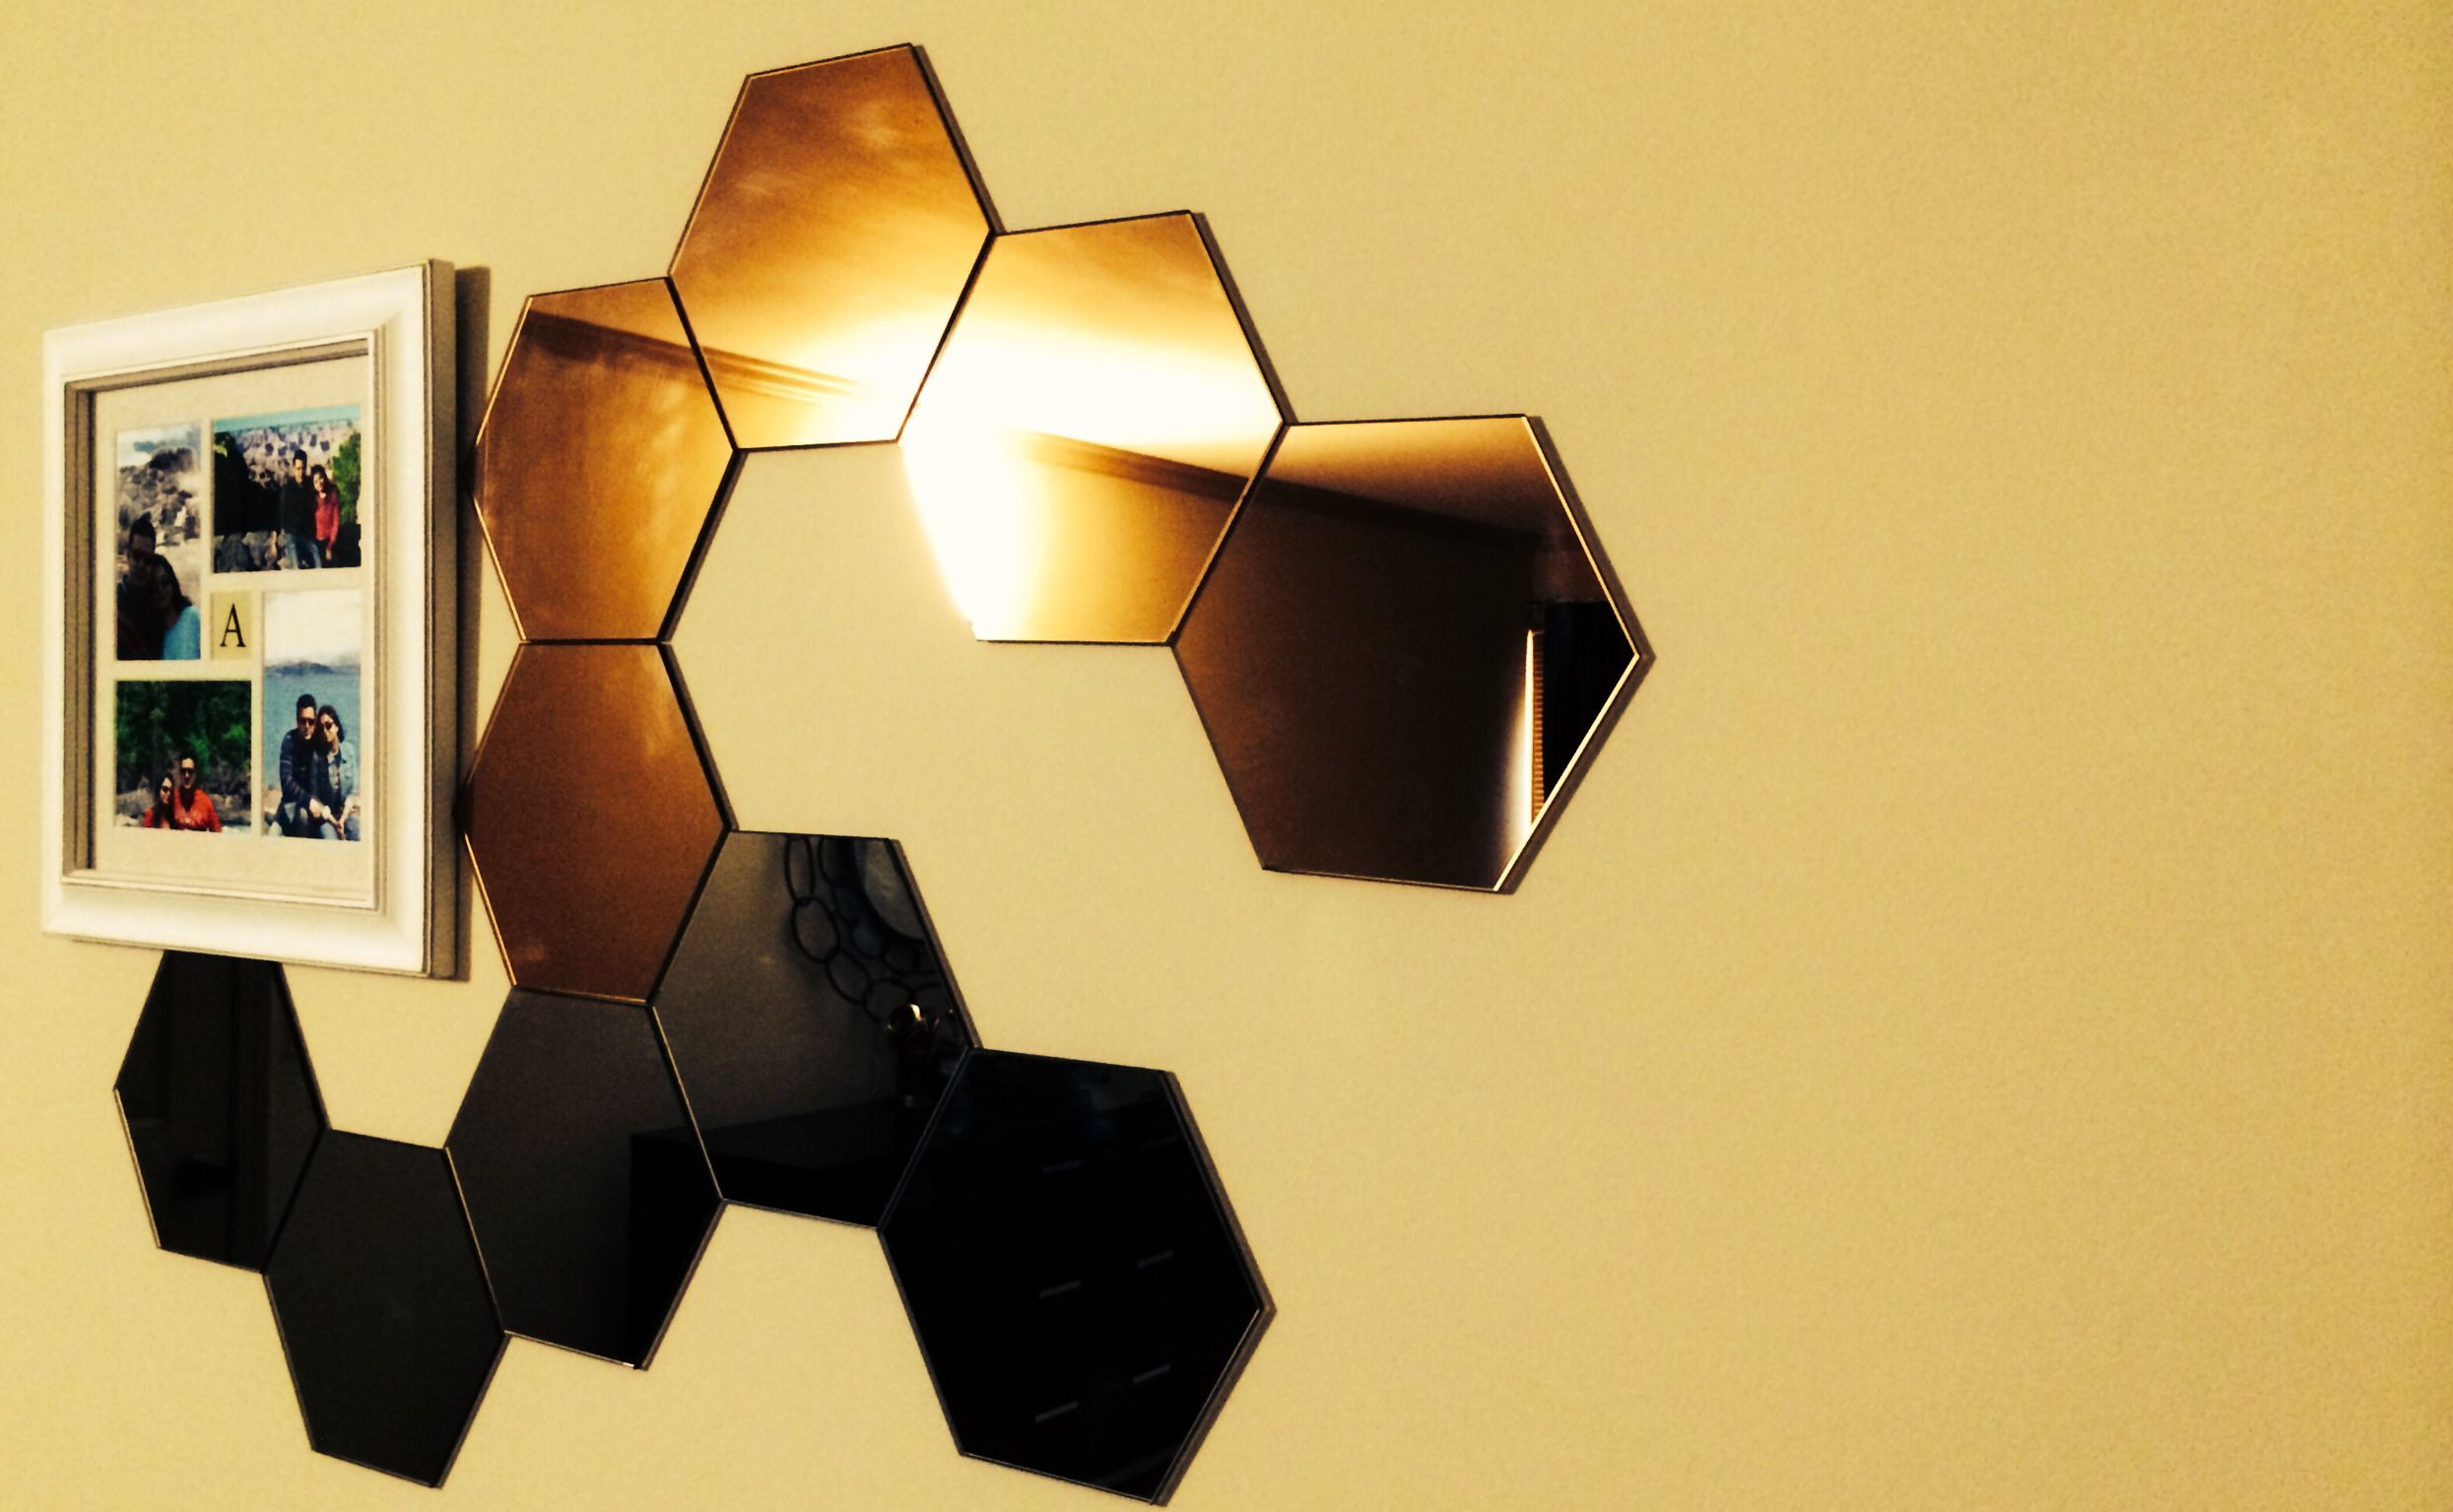 Ikea honefoss mirror with a photo frame | Home | Pinterest | House